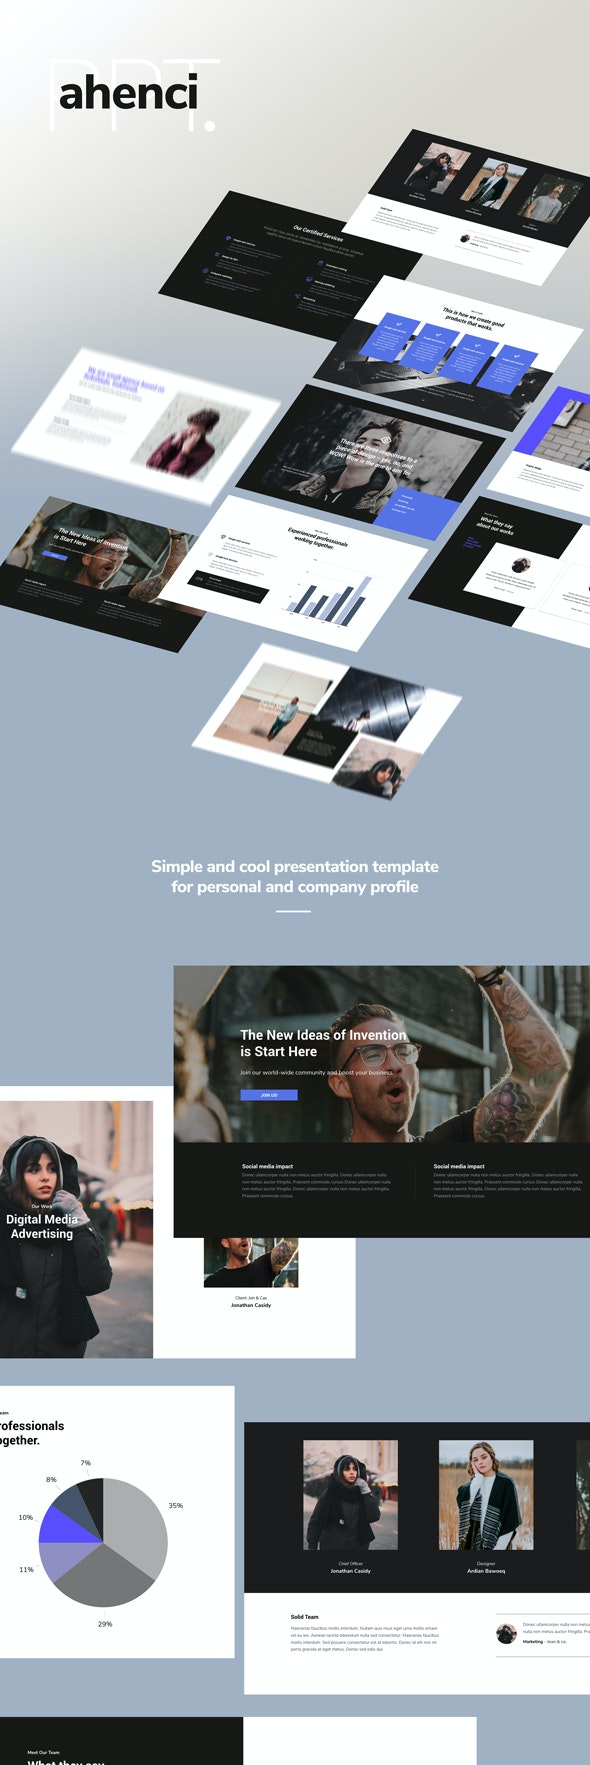 Ahenci - Powerpoint Template - Presentation Templates